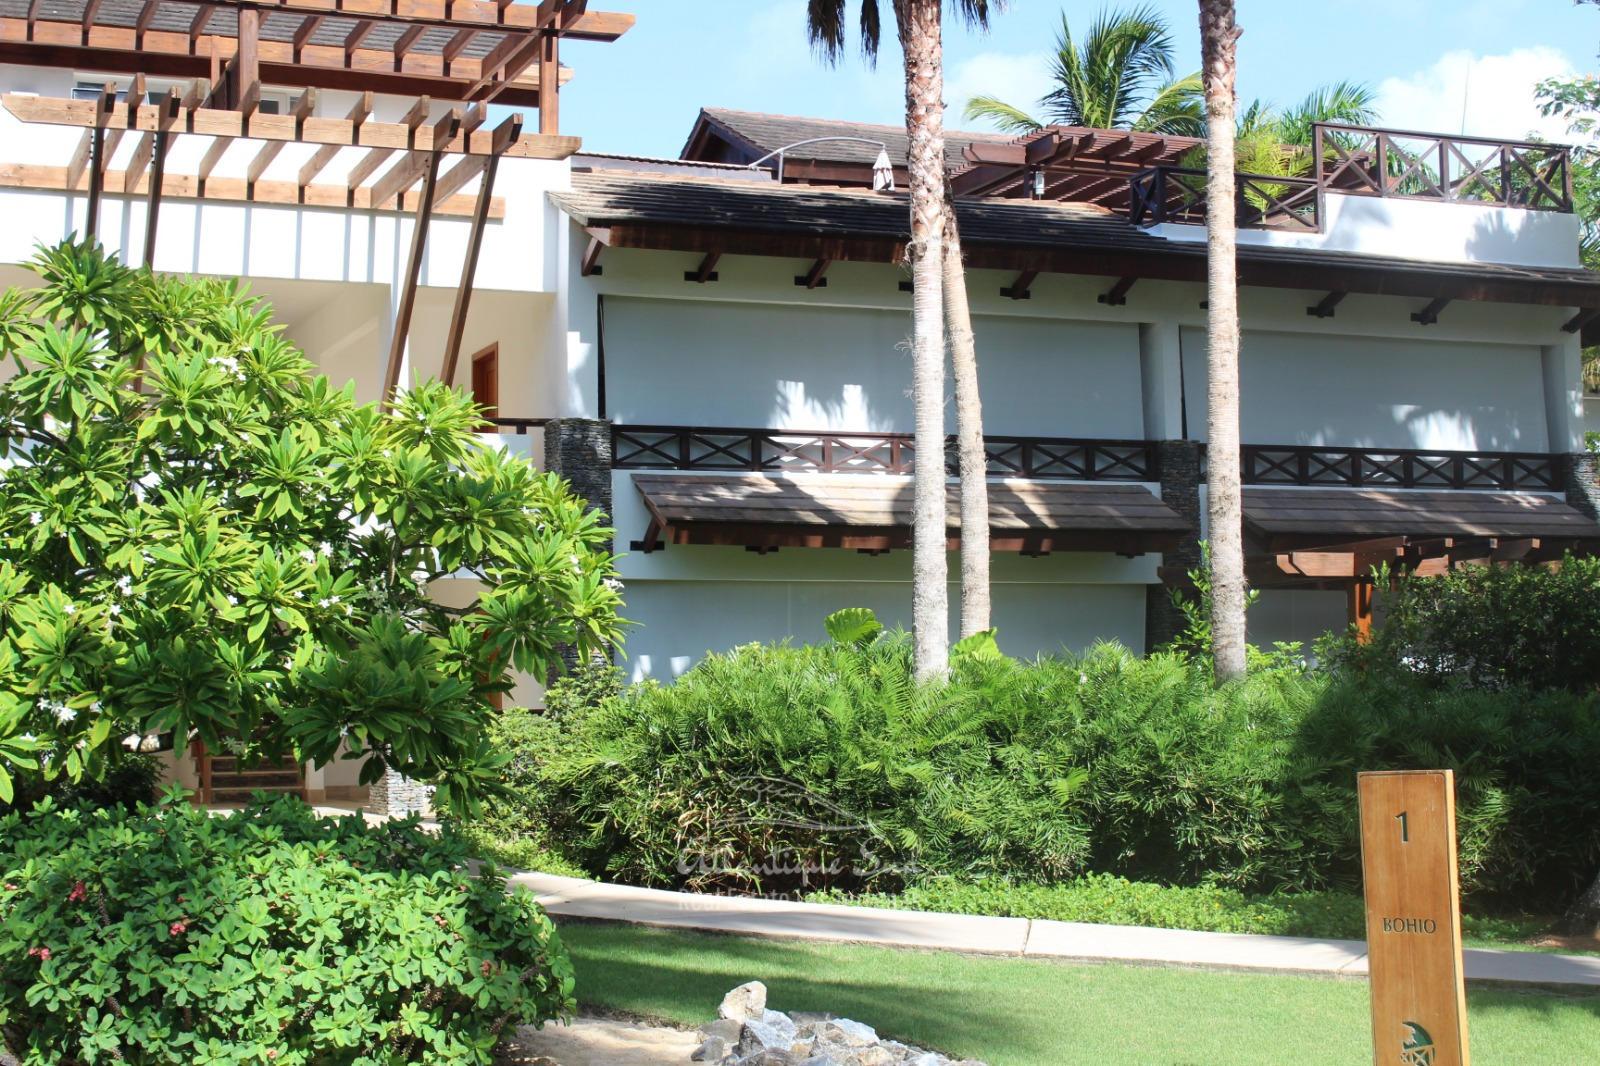 Apartments near the beach real estate las terrenas dominican republic55.jpg